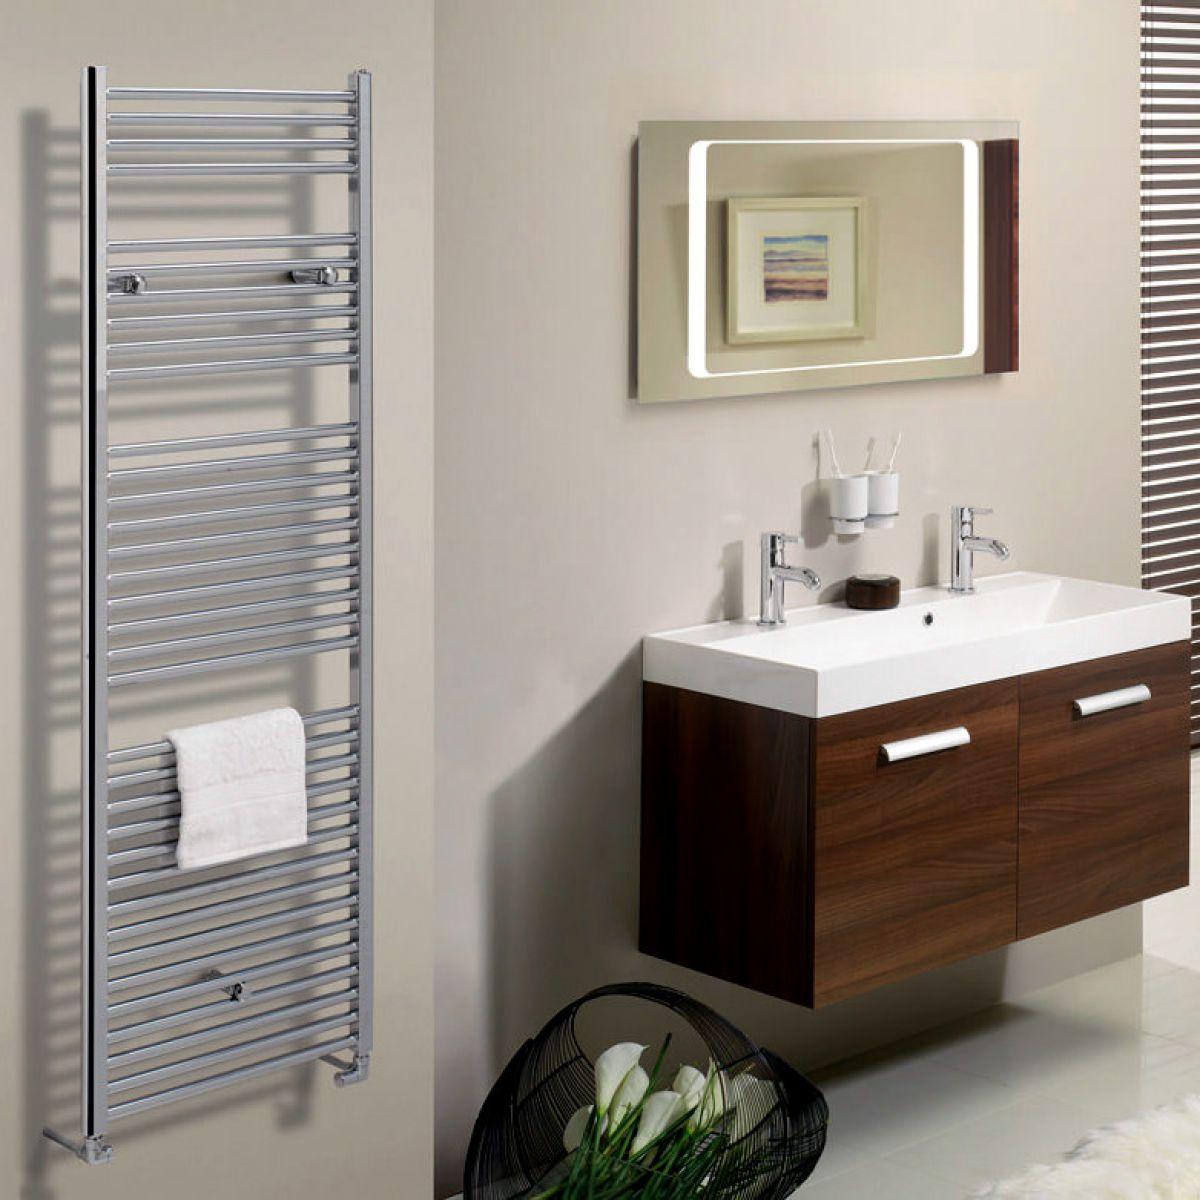 bauhaus design flat towel rail uk bathrooms. Black Bedroom Furniture Sets. Home Design Ideas